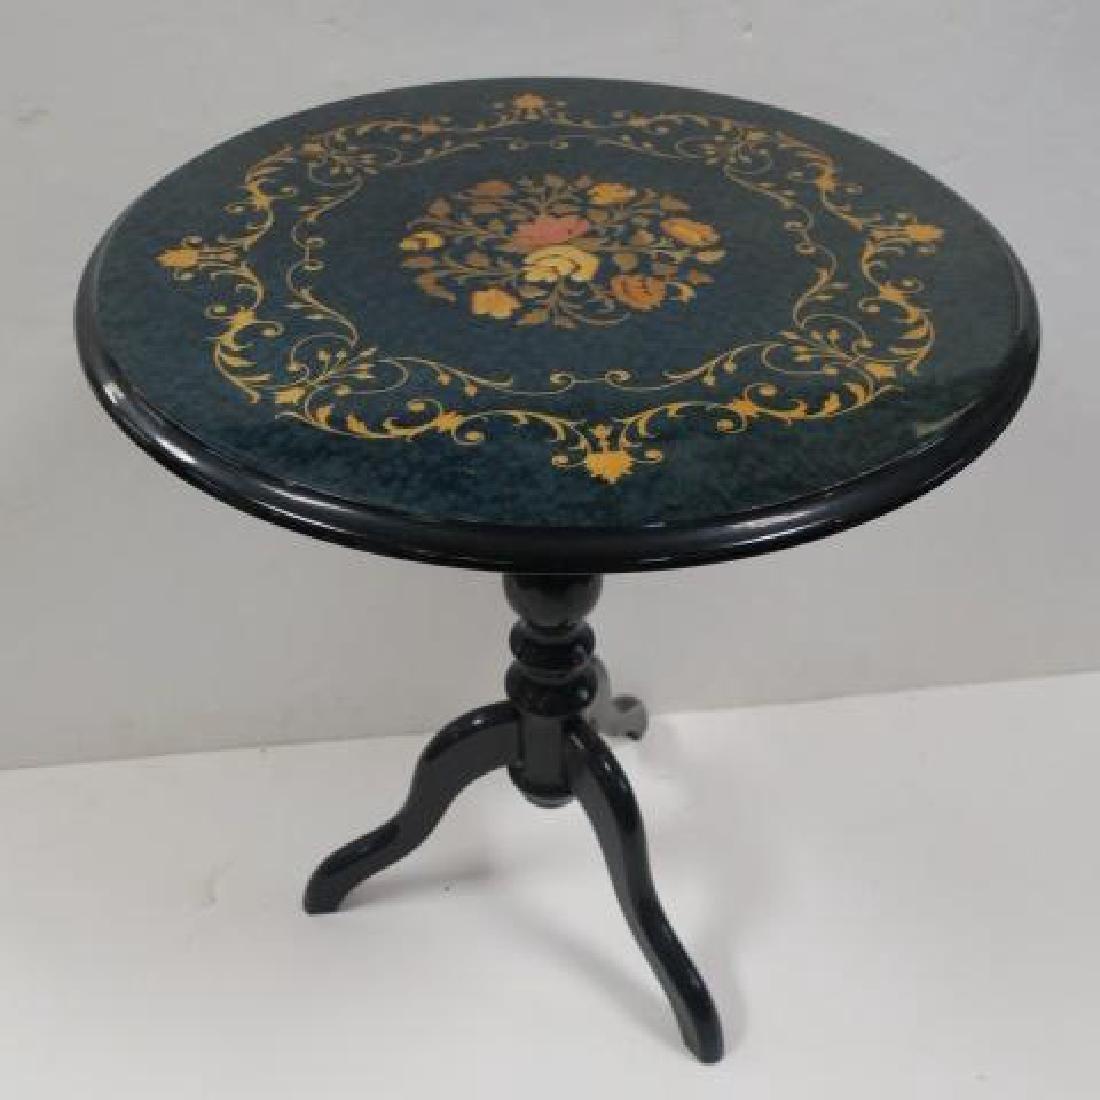 Italian Jade Color on Mahogany Round Pedestal Table: